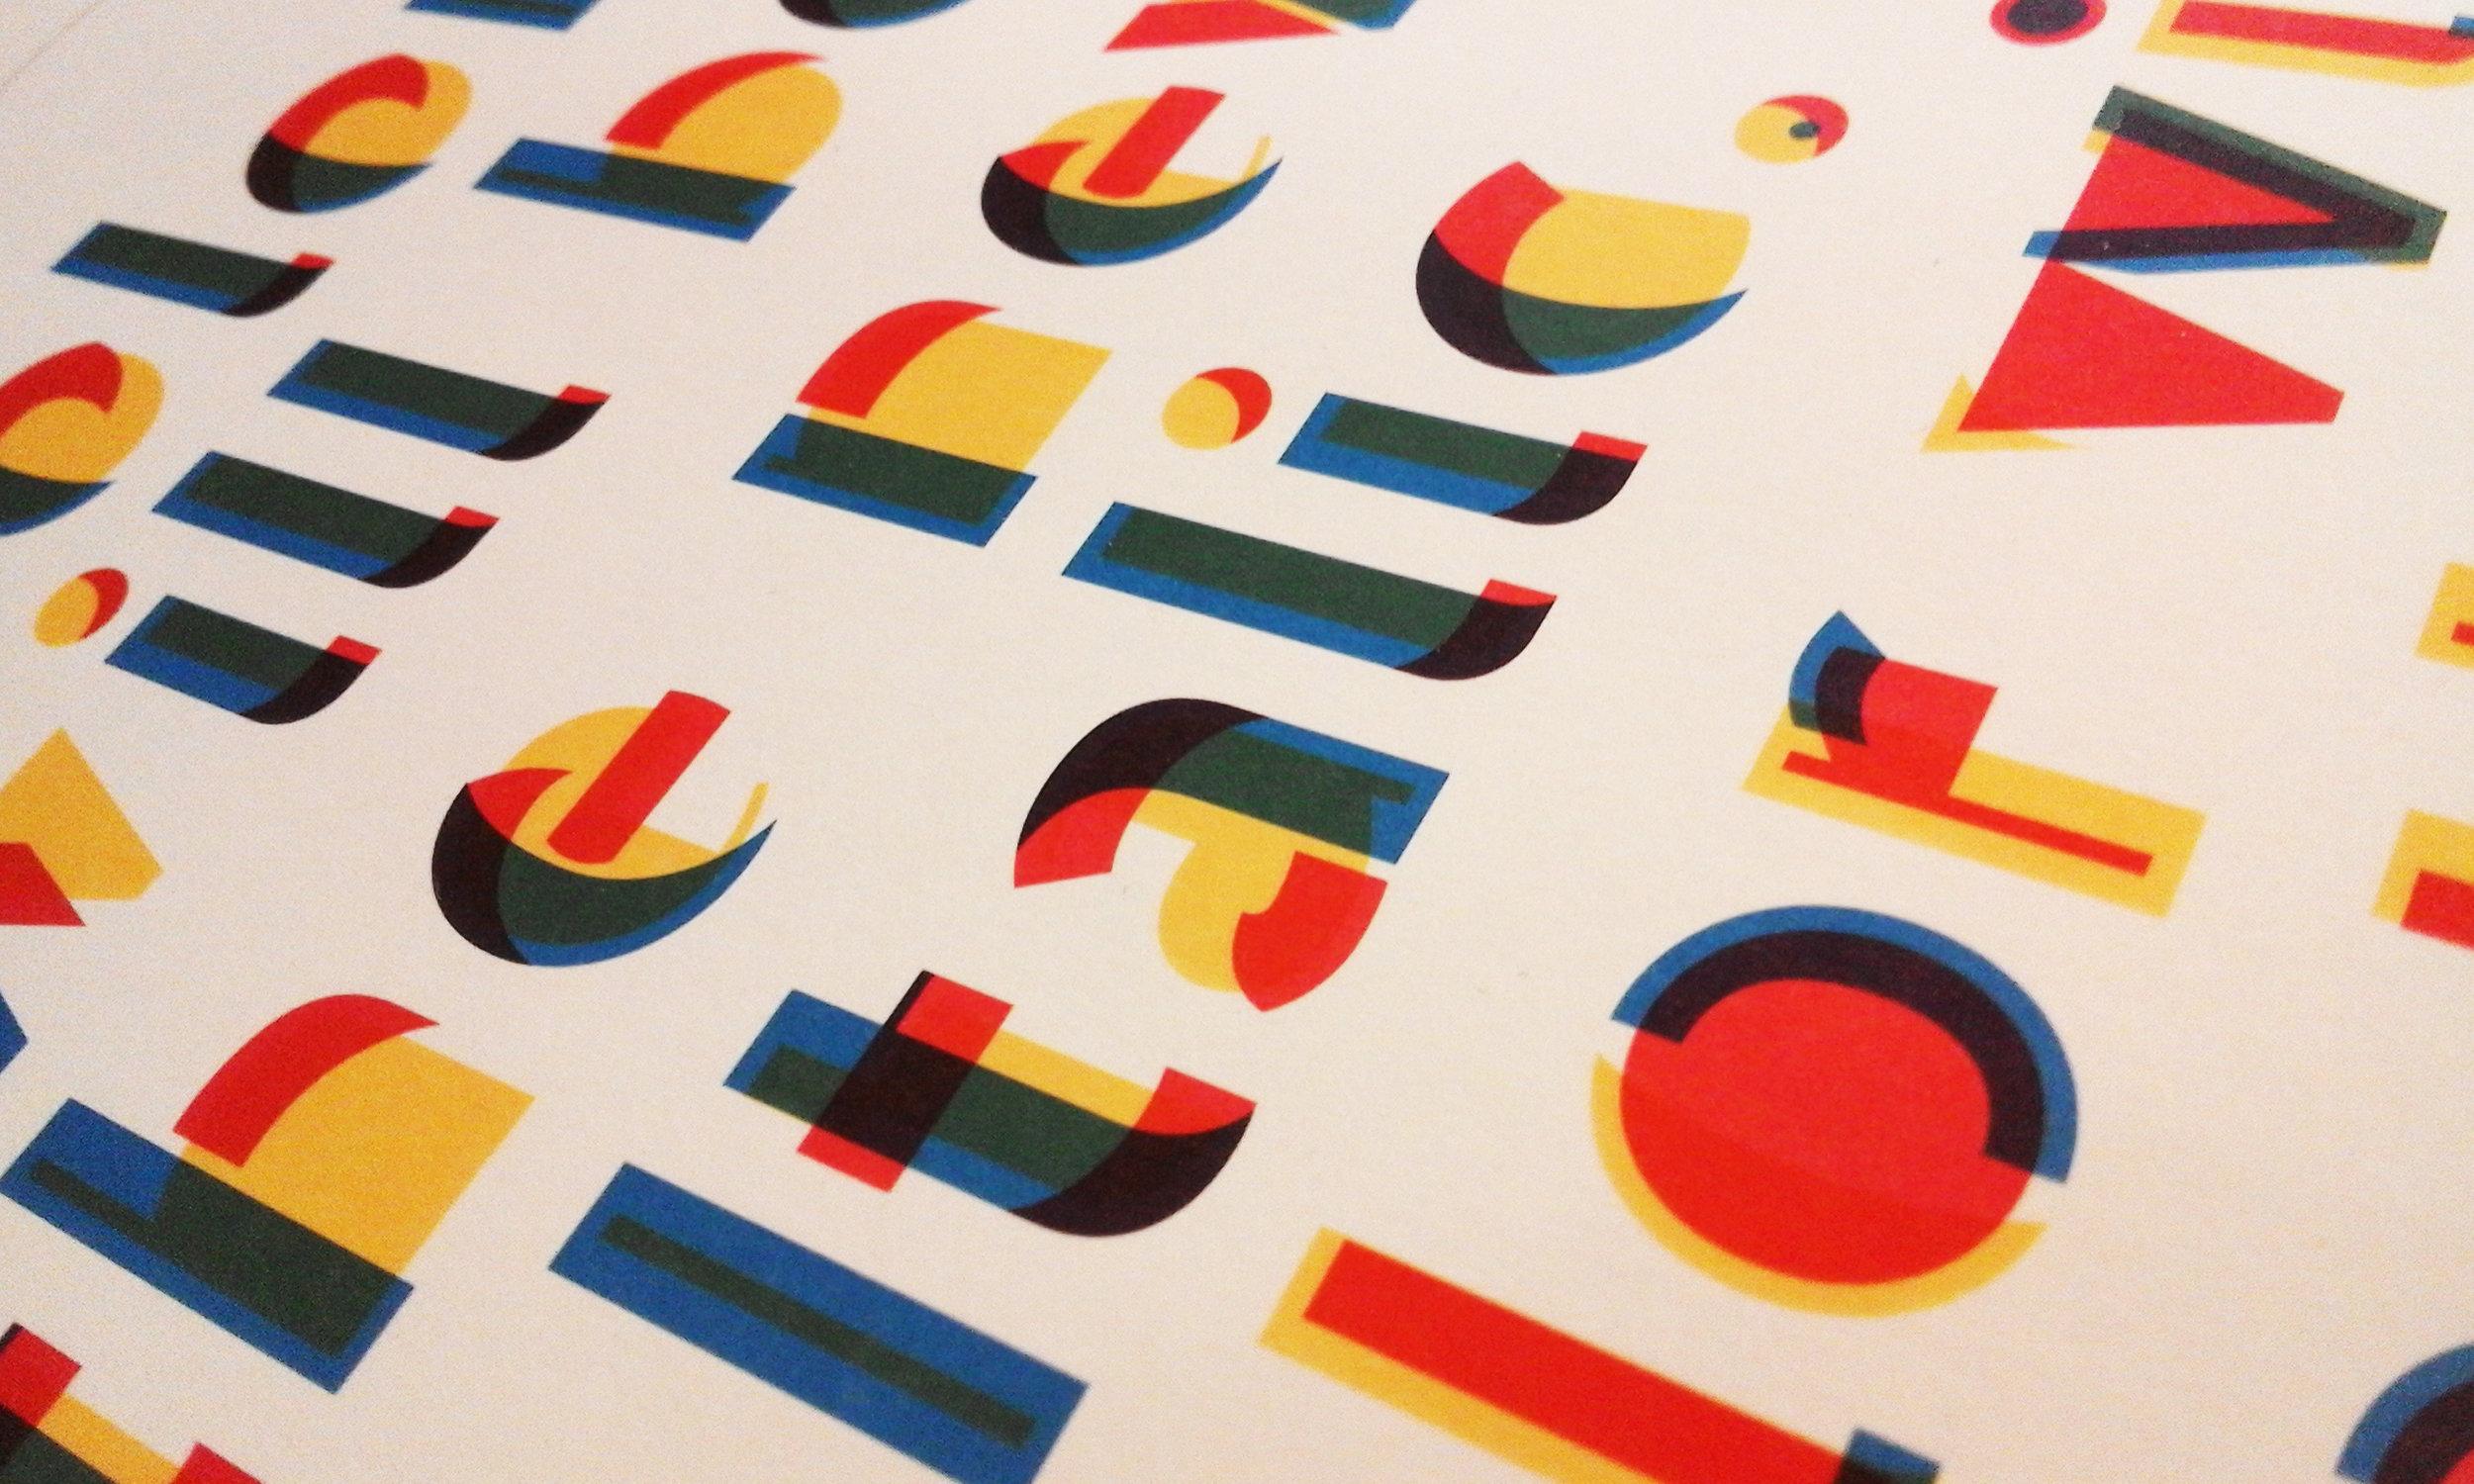 Designnovotypocolorbook01.jpg